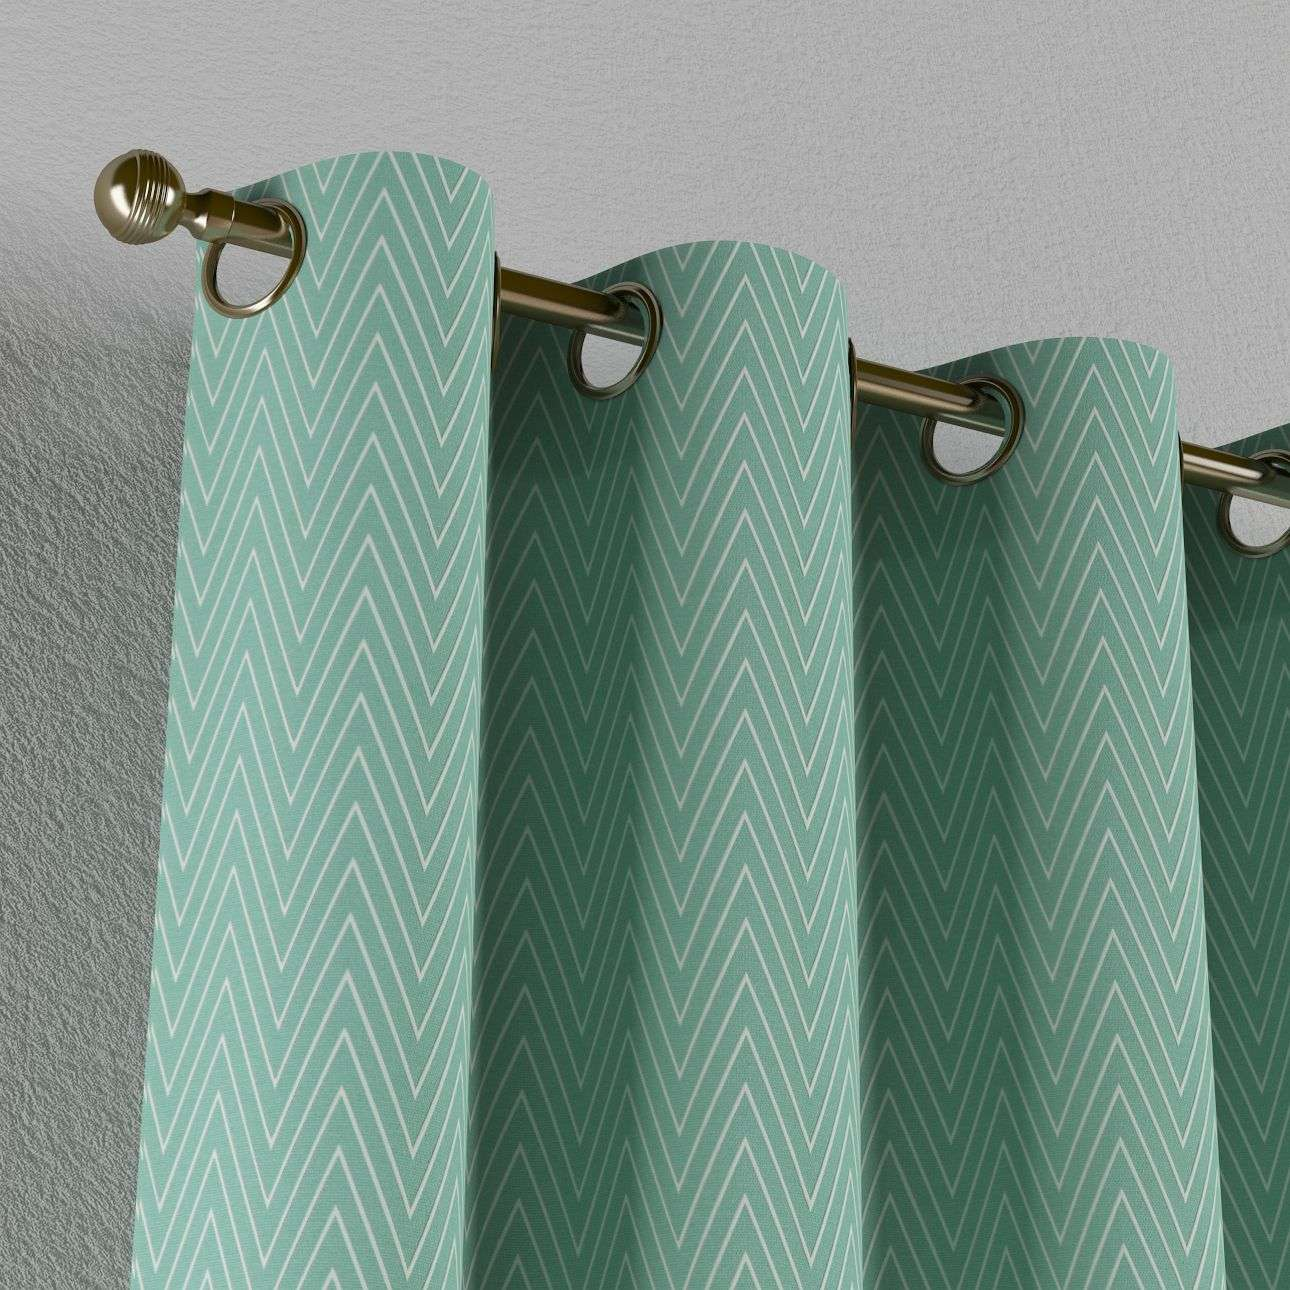 Záves s kolieskami 130 x 260 cm V kolekcii Brooklyn, tkanina: 137-90